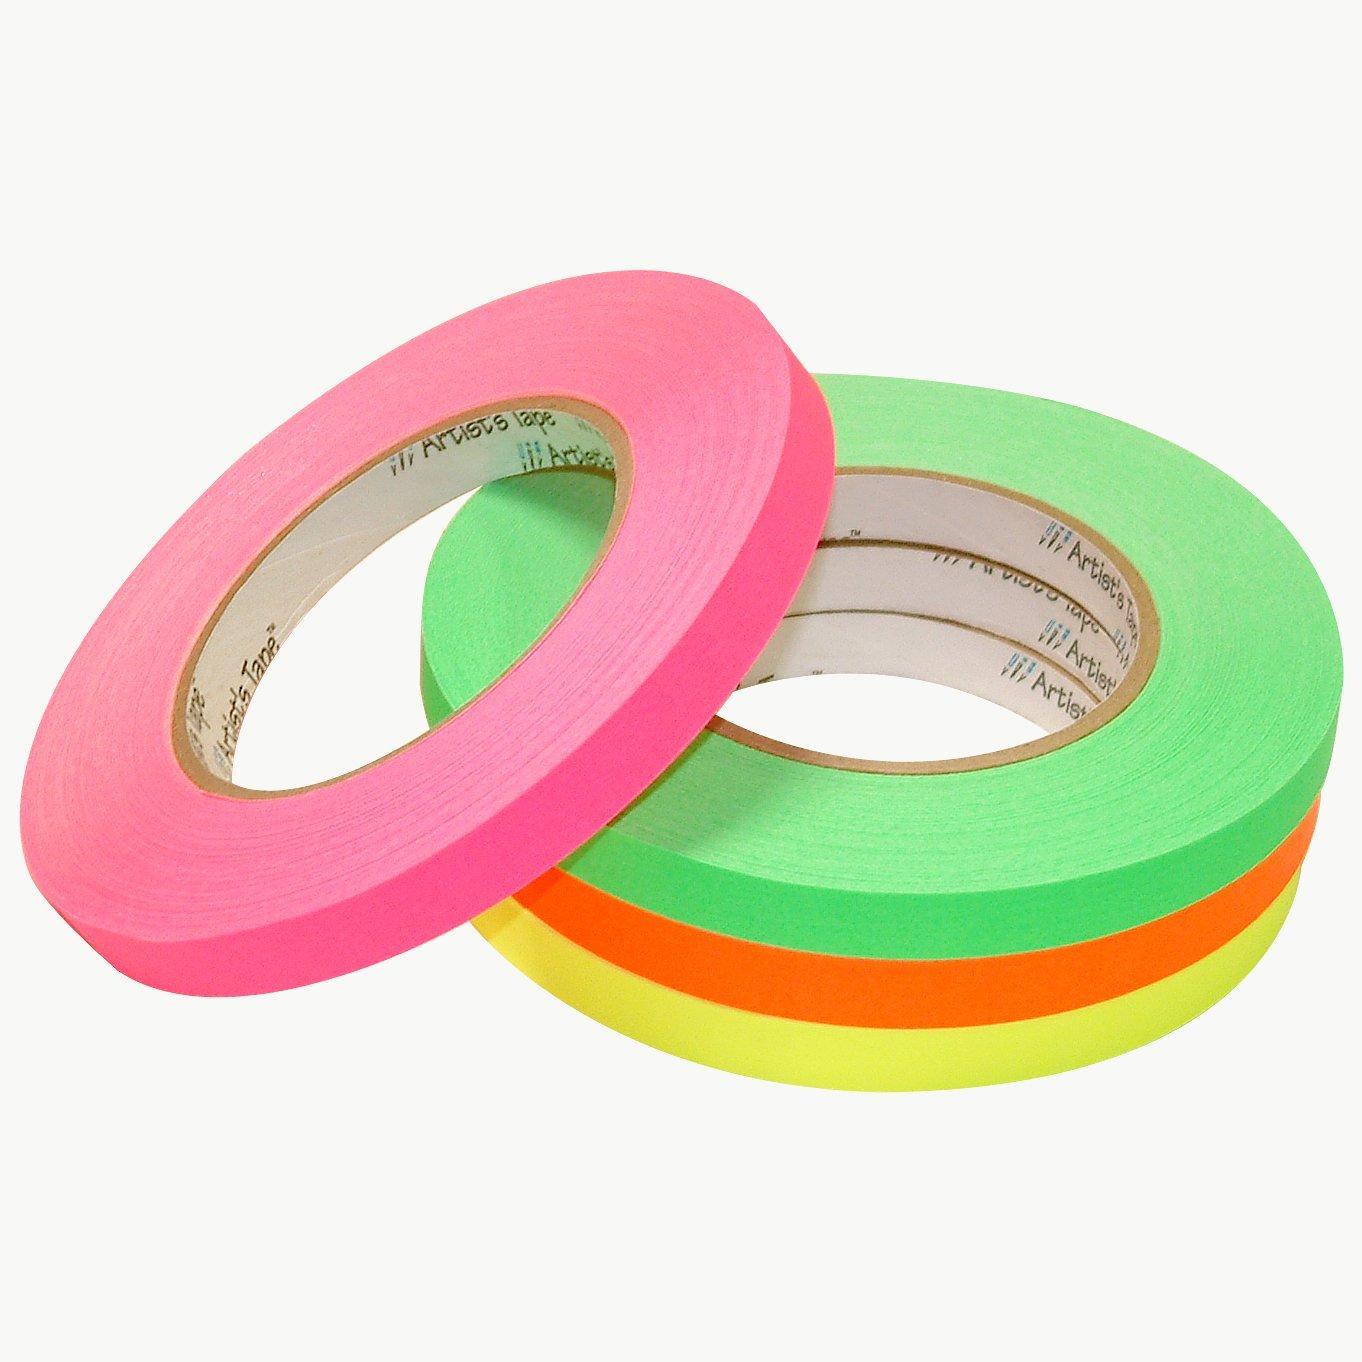 Pro Tapes 15414 Artist Tape Fluorescent Green 1'', Fluorescent green